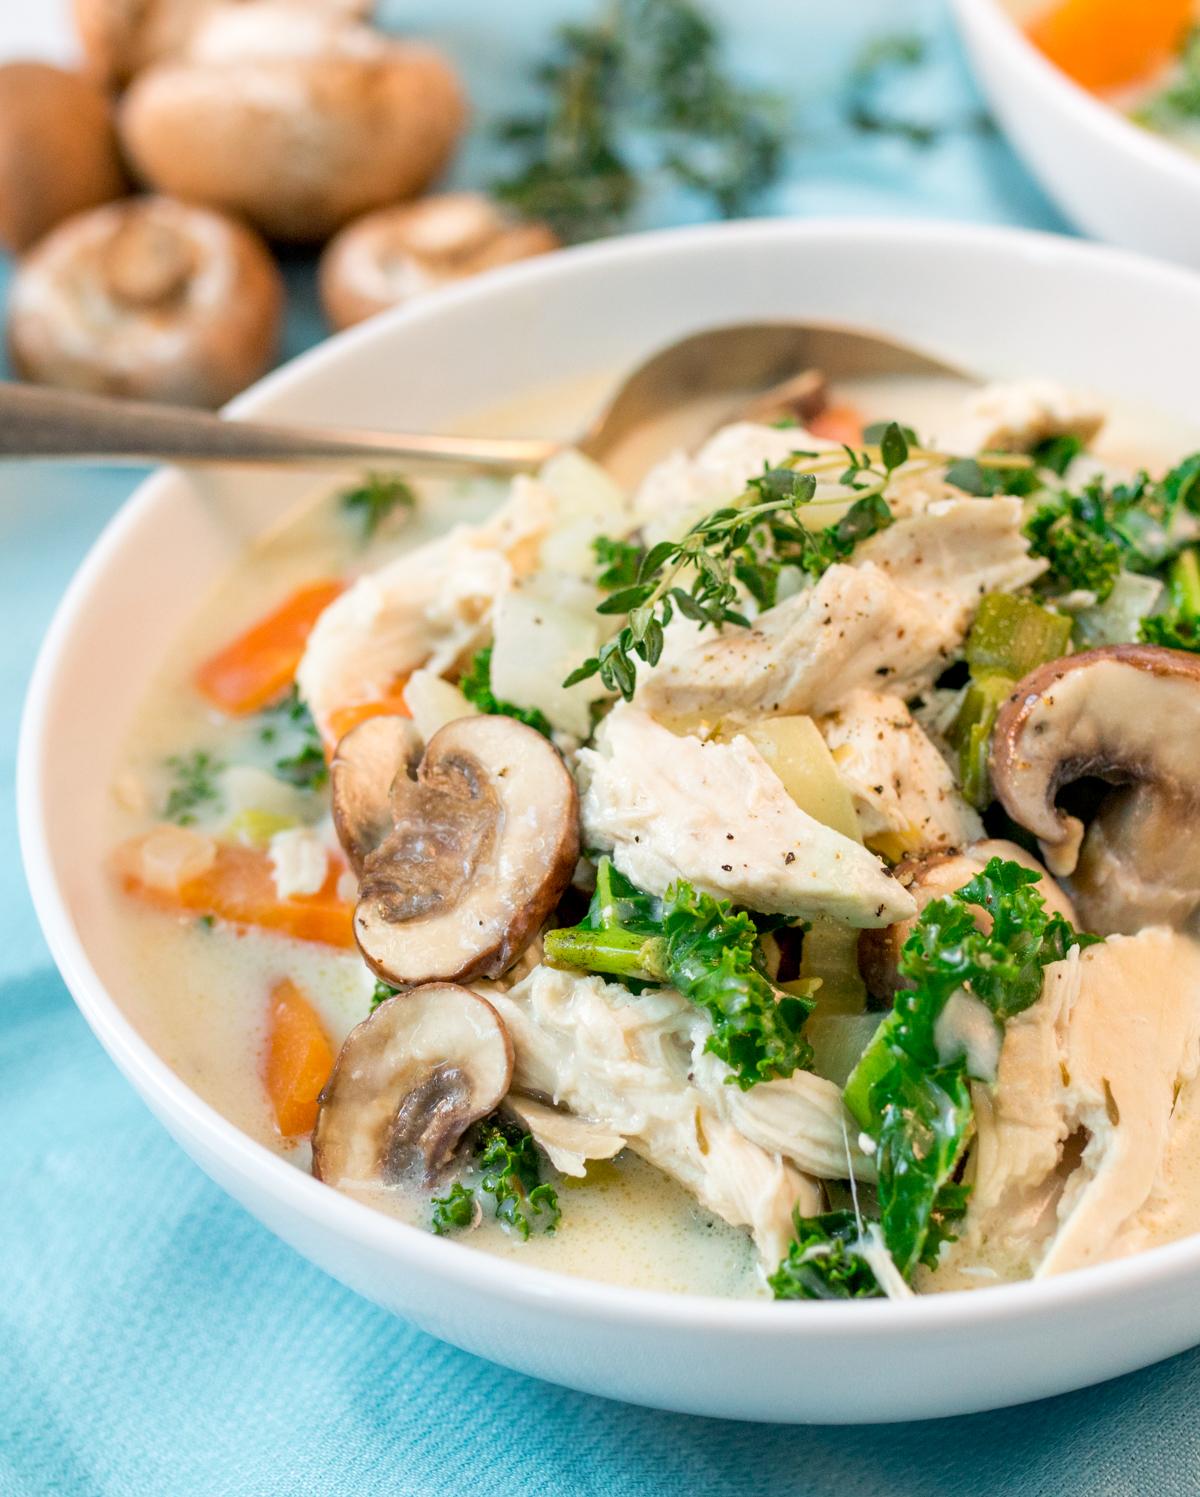 Creamy chicken and mushroom soup tall